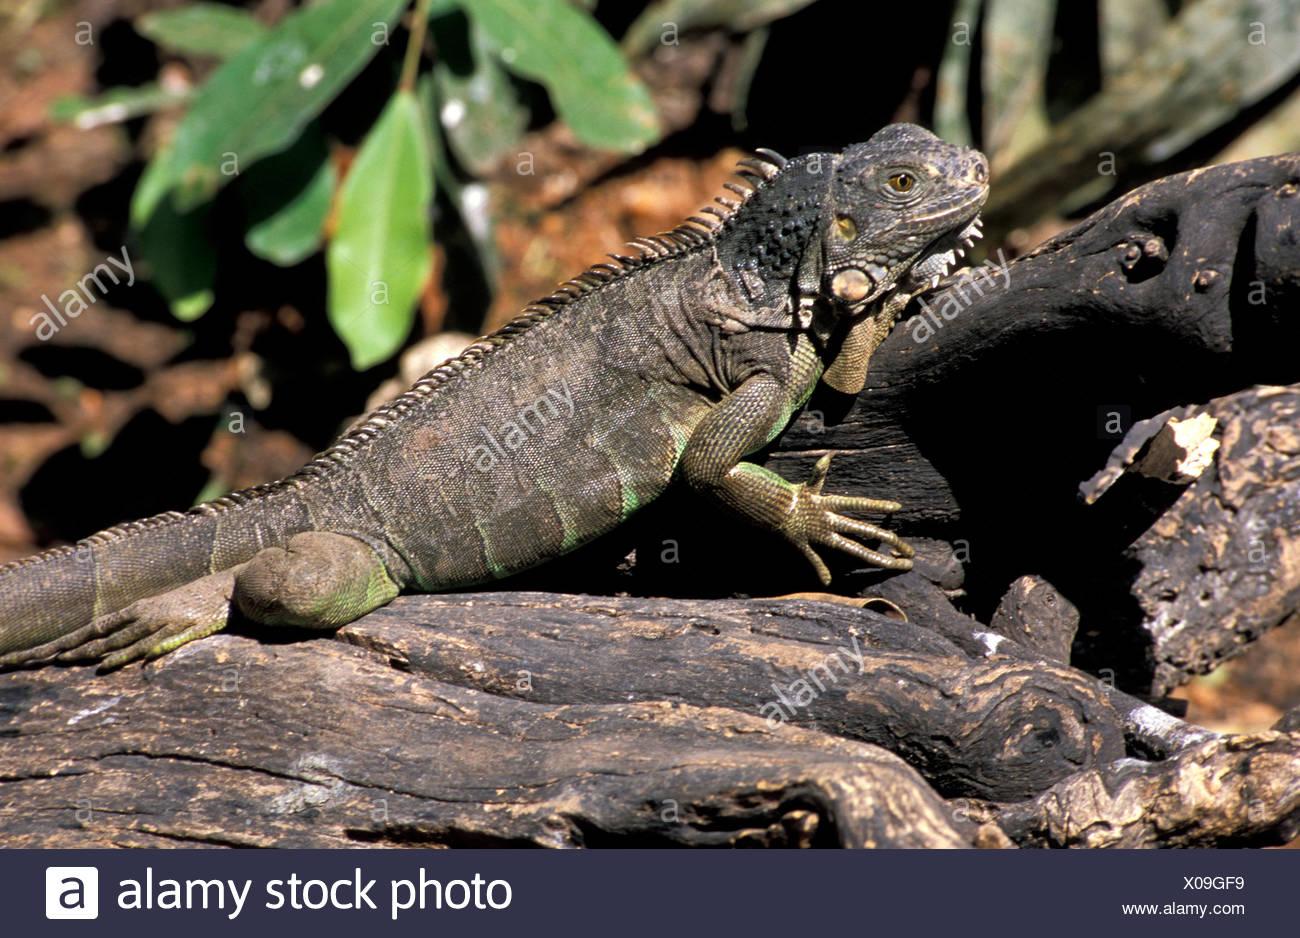 Chiapas Tuxtla Gutierrez Iguana iguana Mexico Central America America lizard - Stock Image